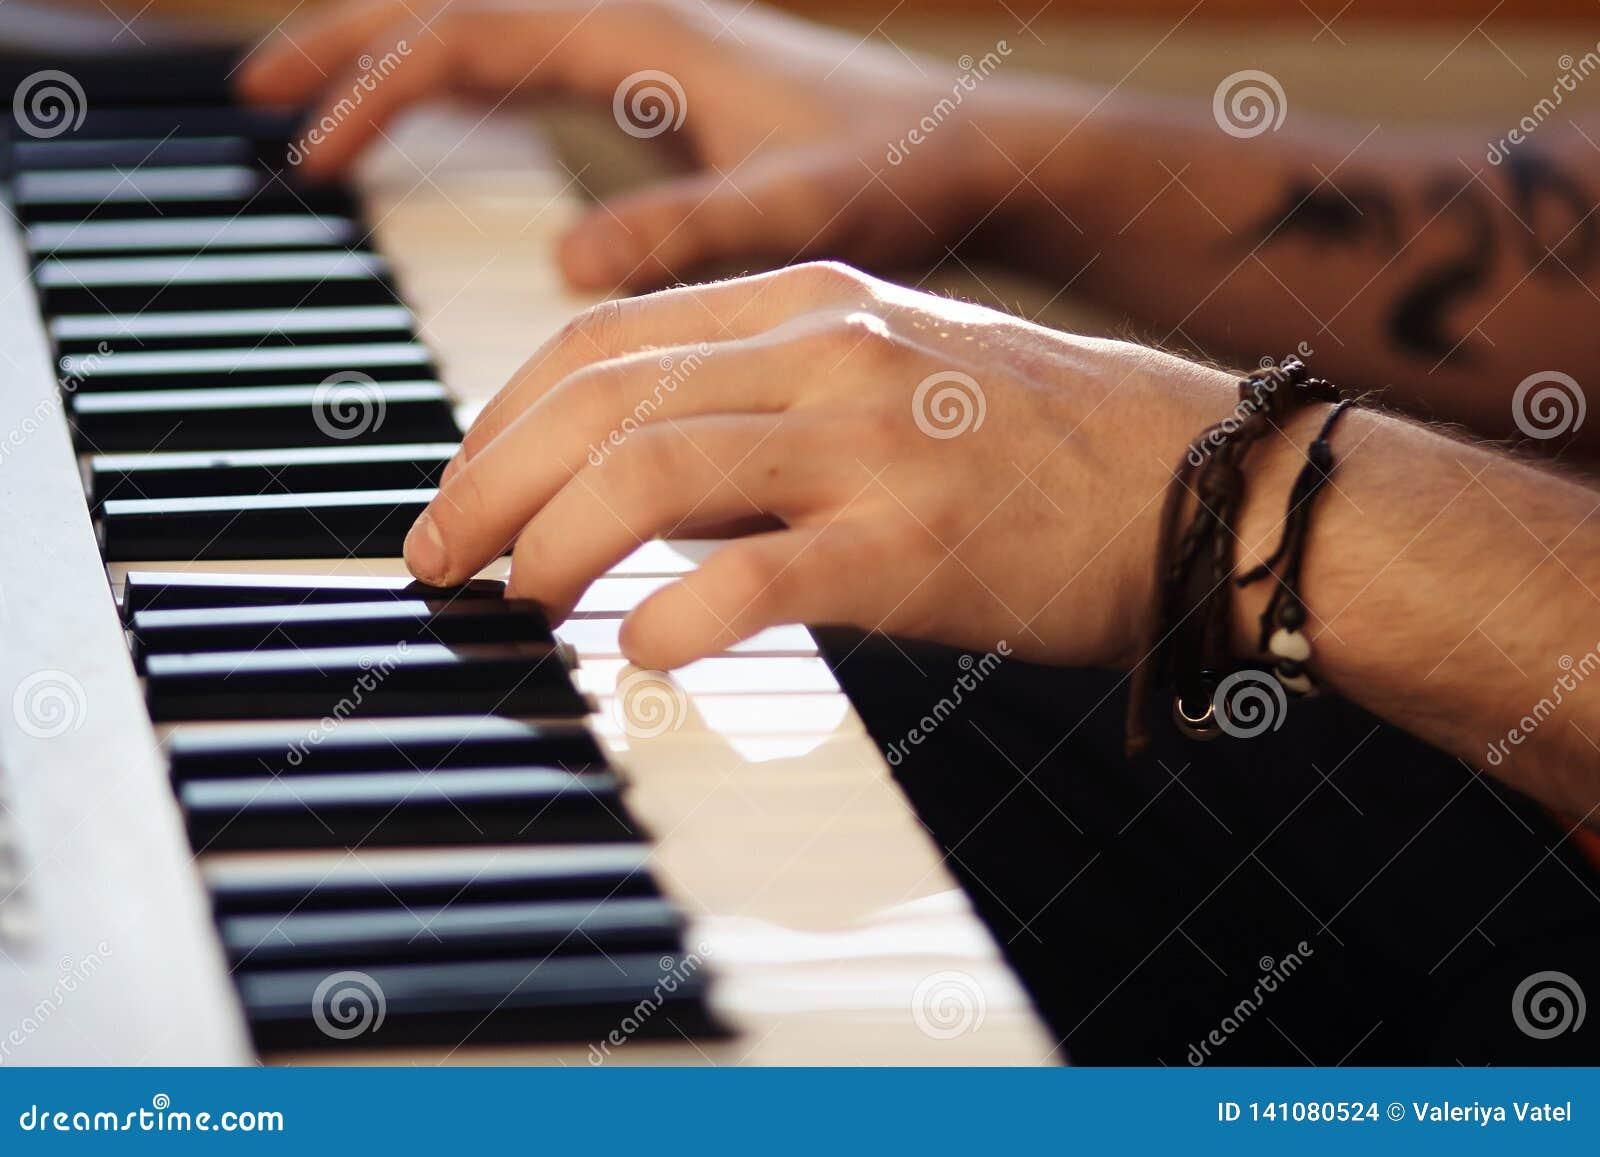 Mooi mannelijk handenspel op moderne synthesizer